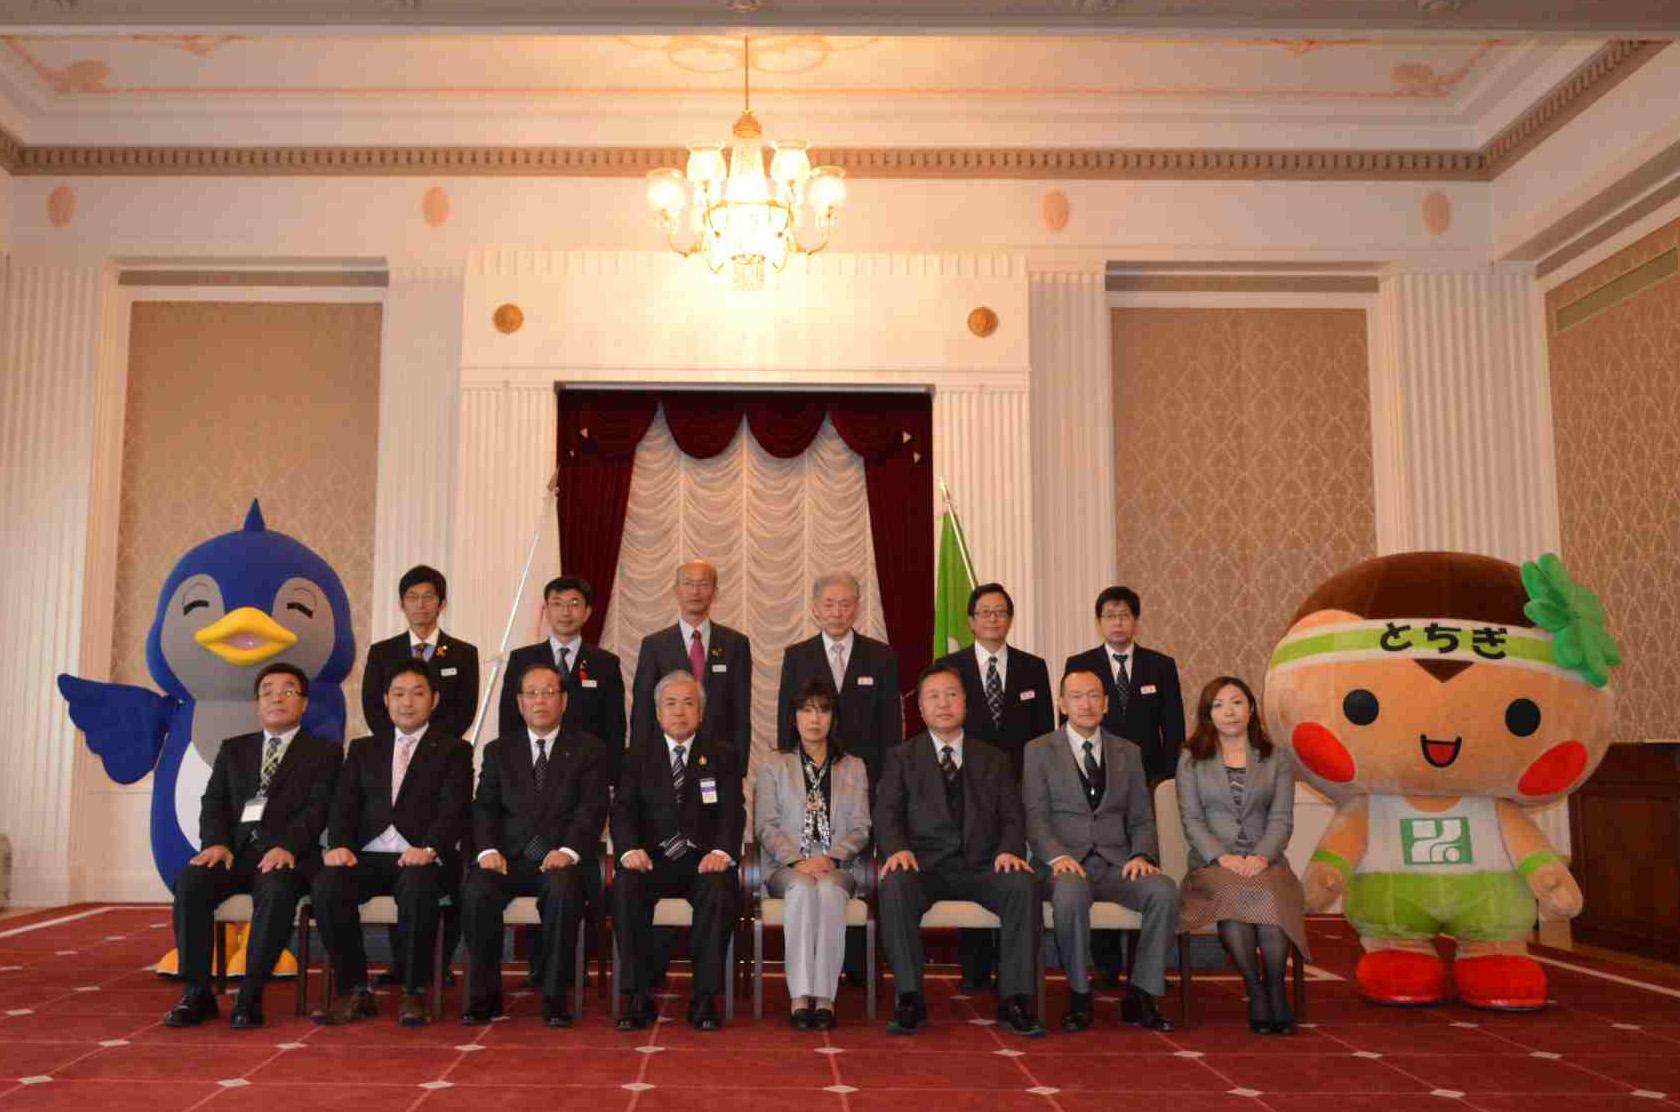 県知事賞は1事業所(東武宇都宮百貨店)、財団理事長賞は7事業所が受賞